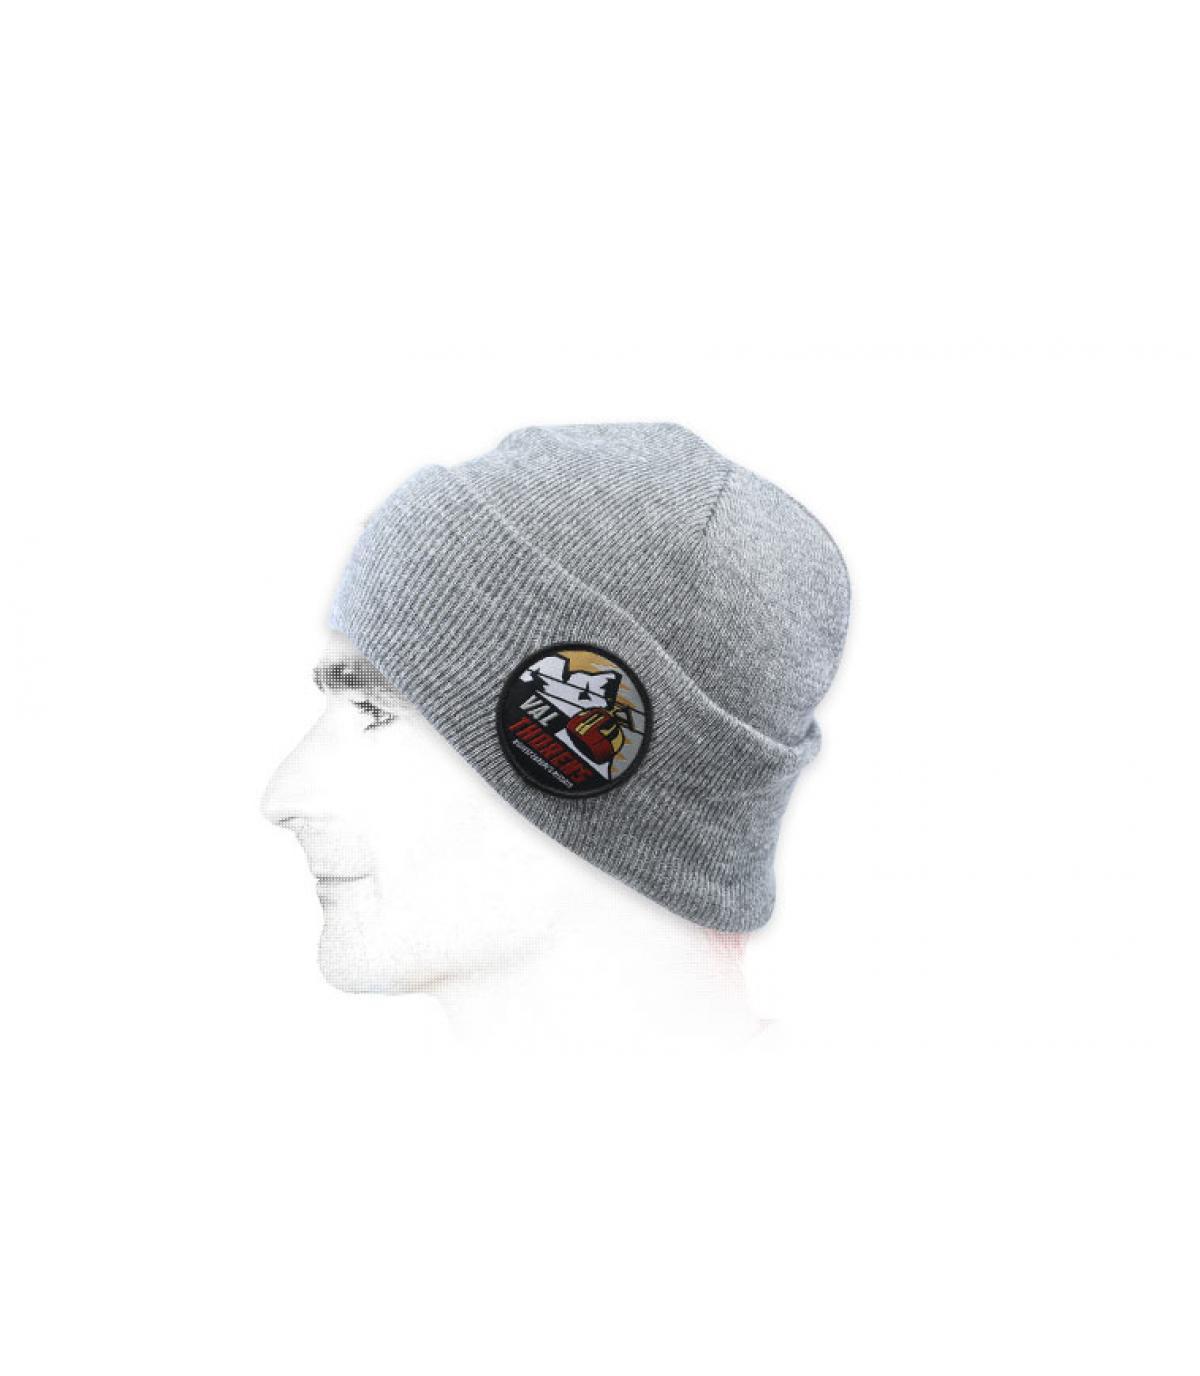 Mütze Val Thorens grau